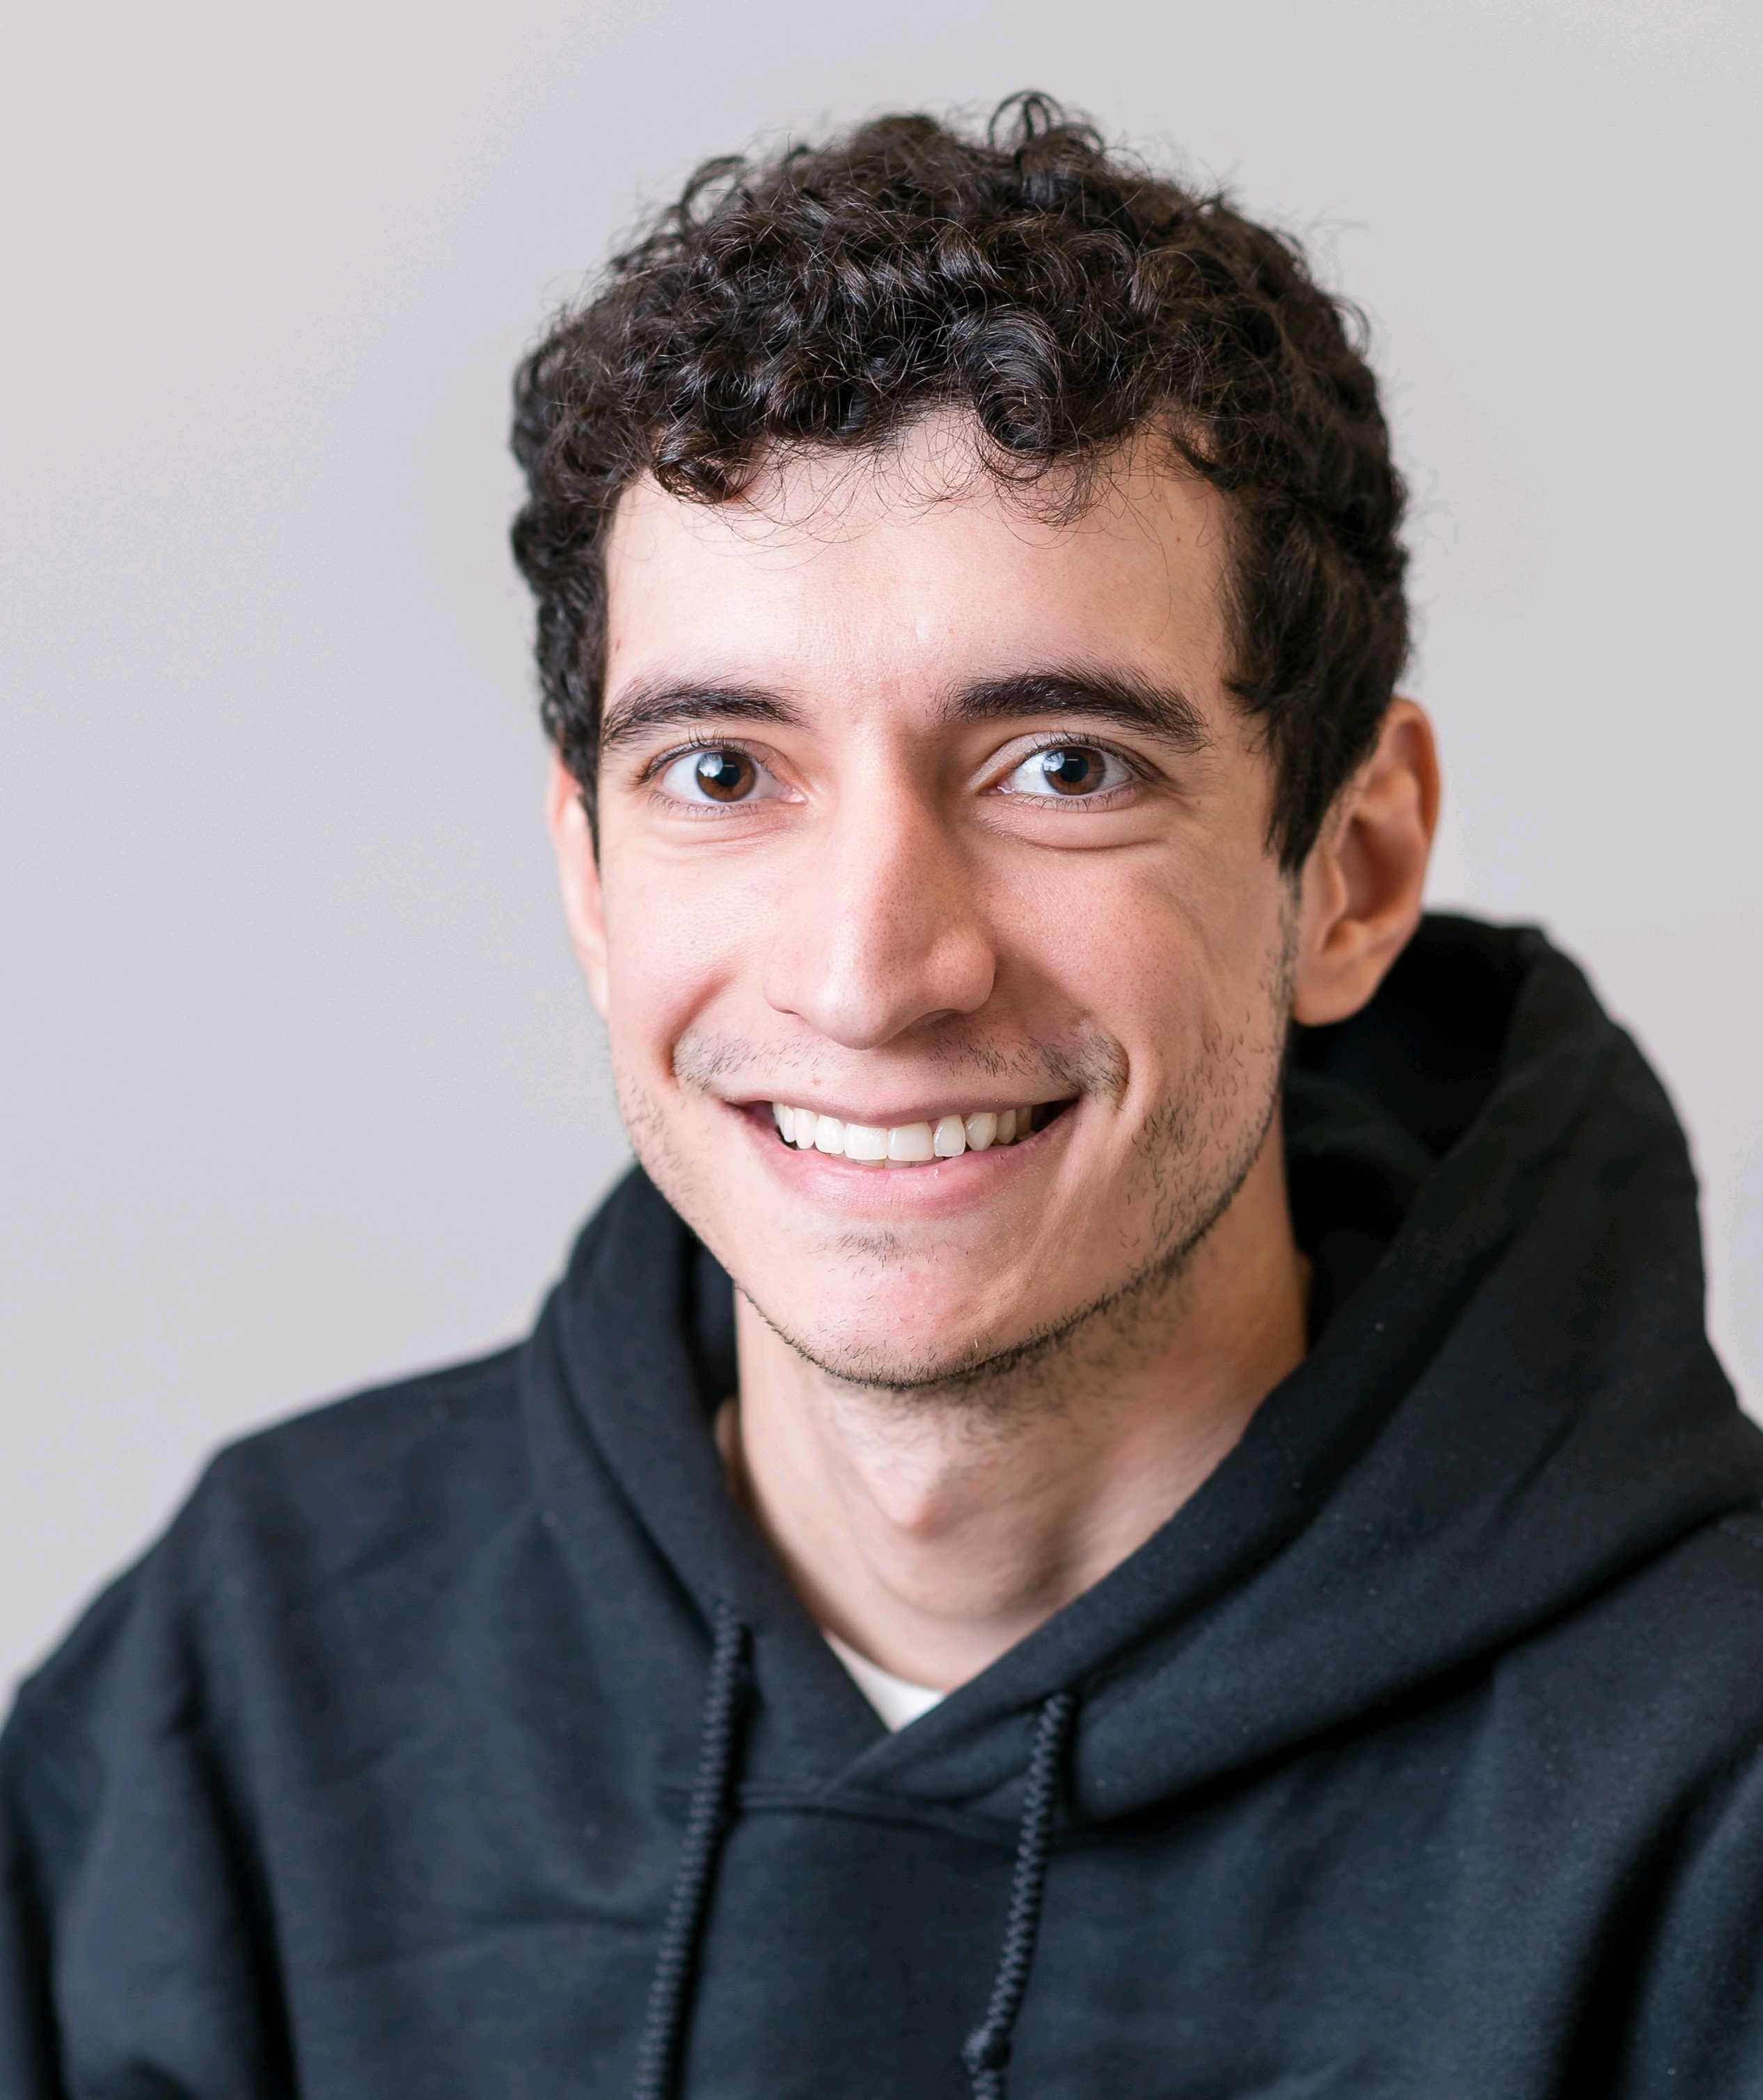 Maurício Jourdan